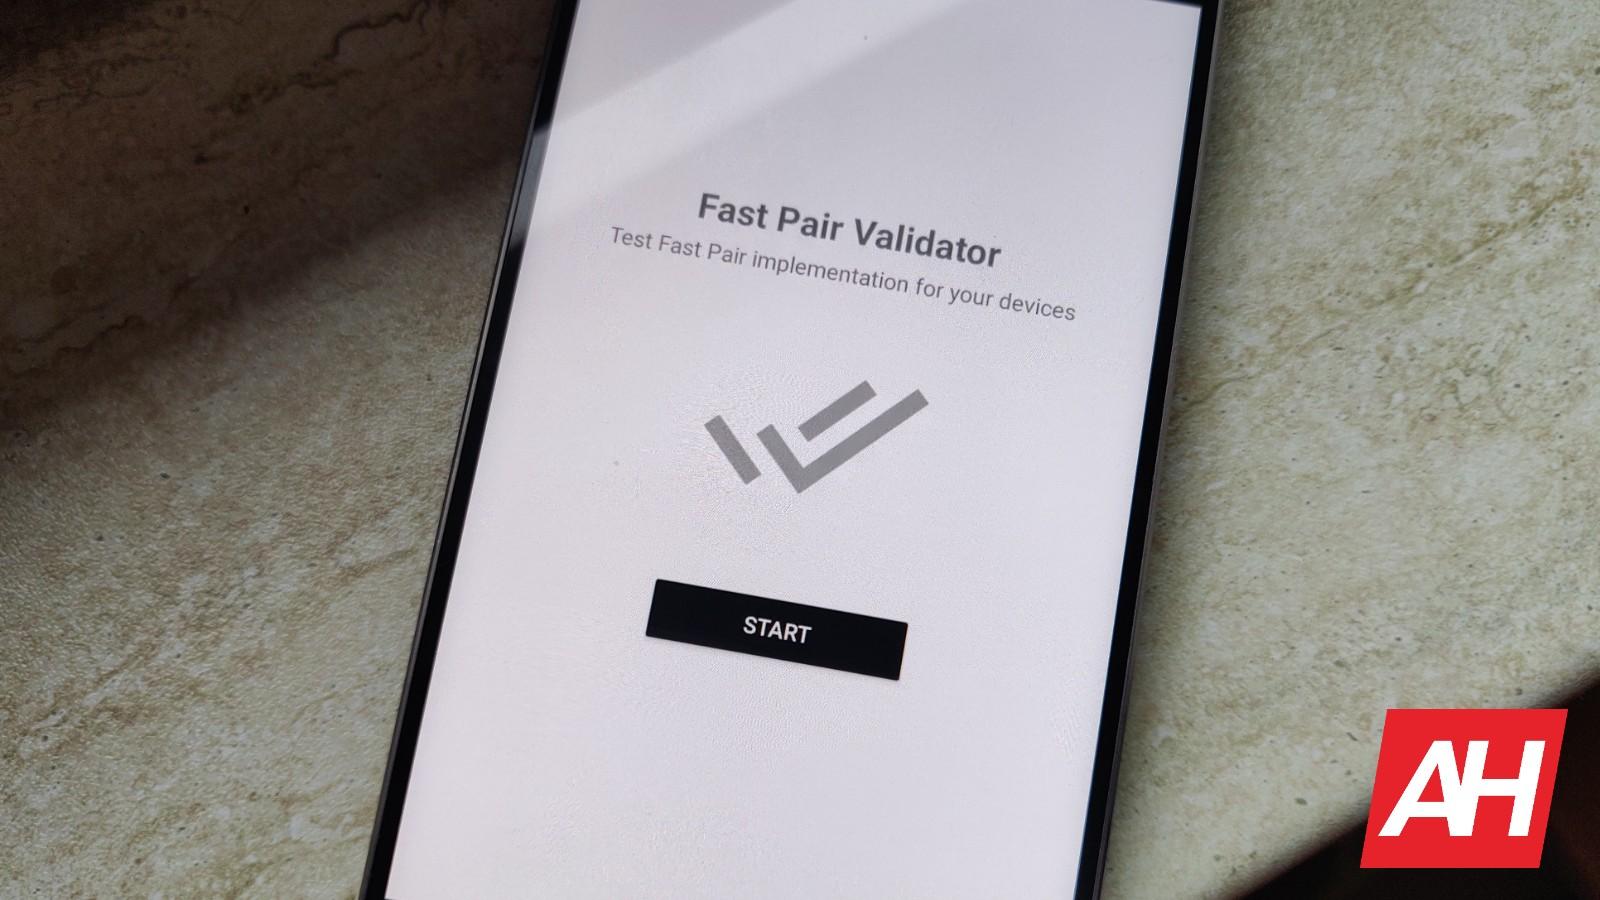 Google's 'Fast Pair Validator' App Hits The Play Store